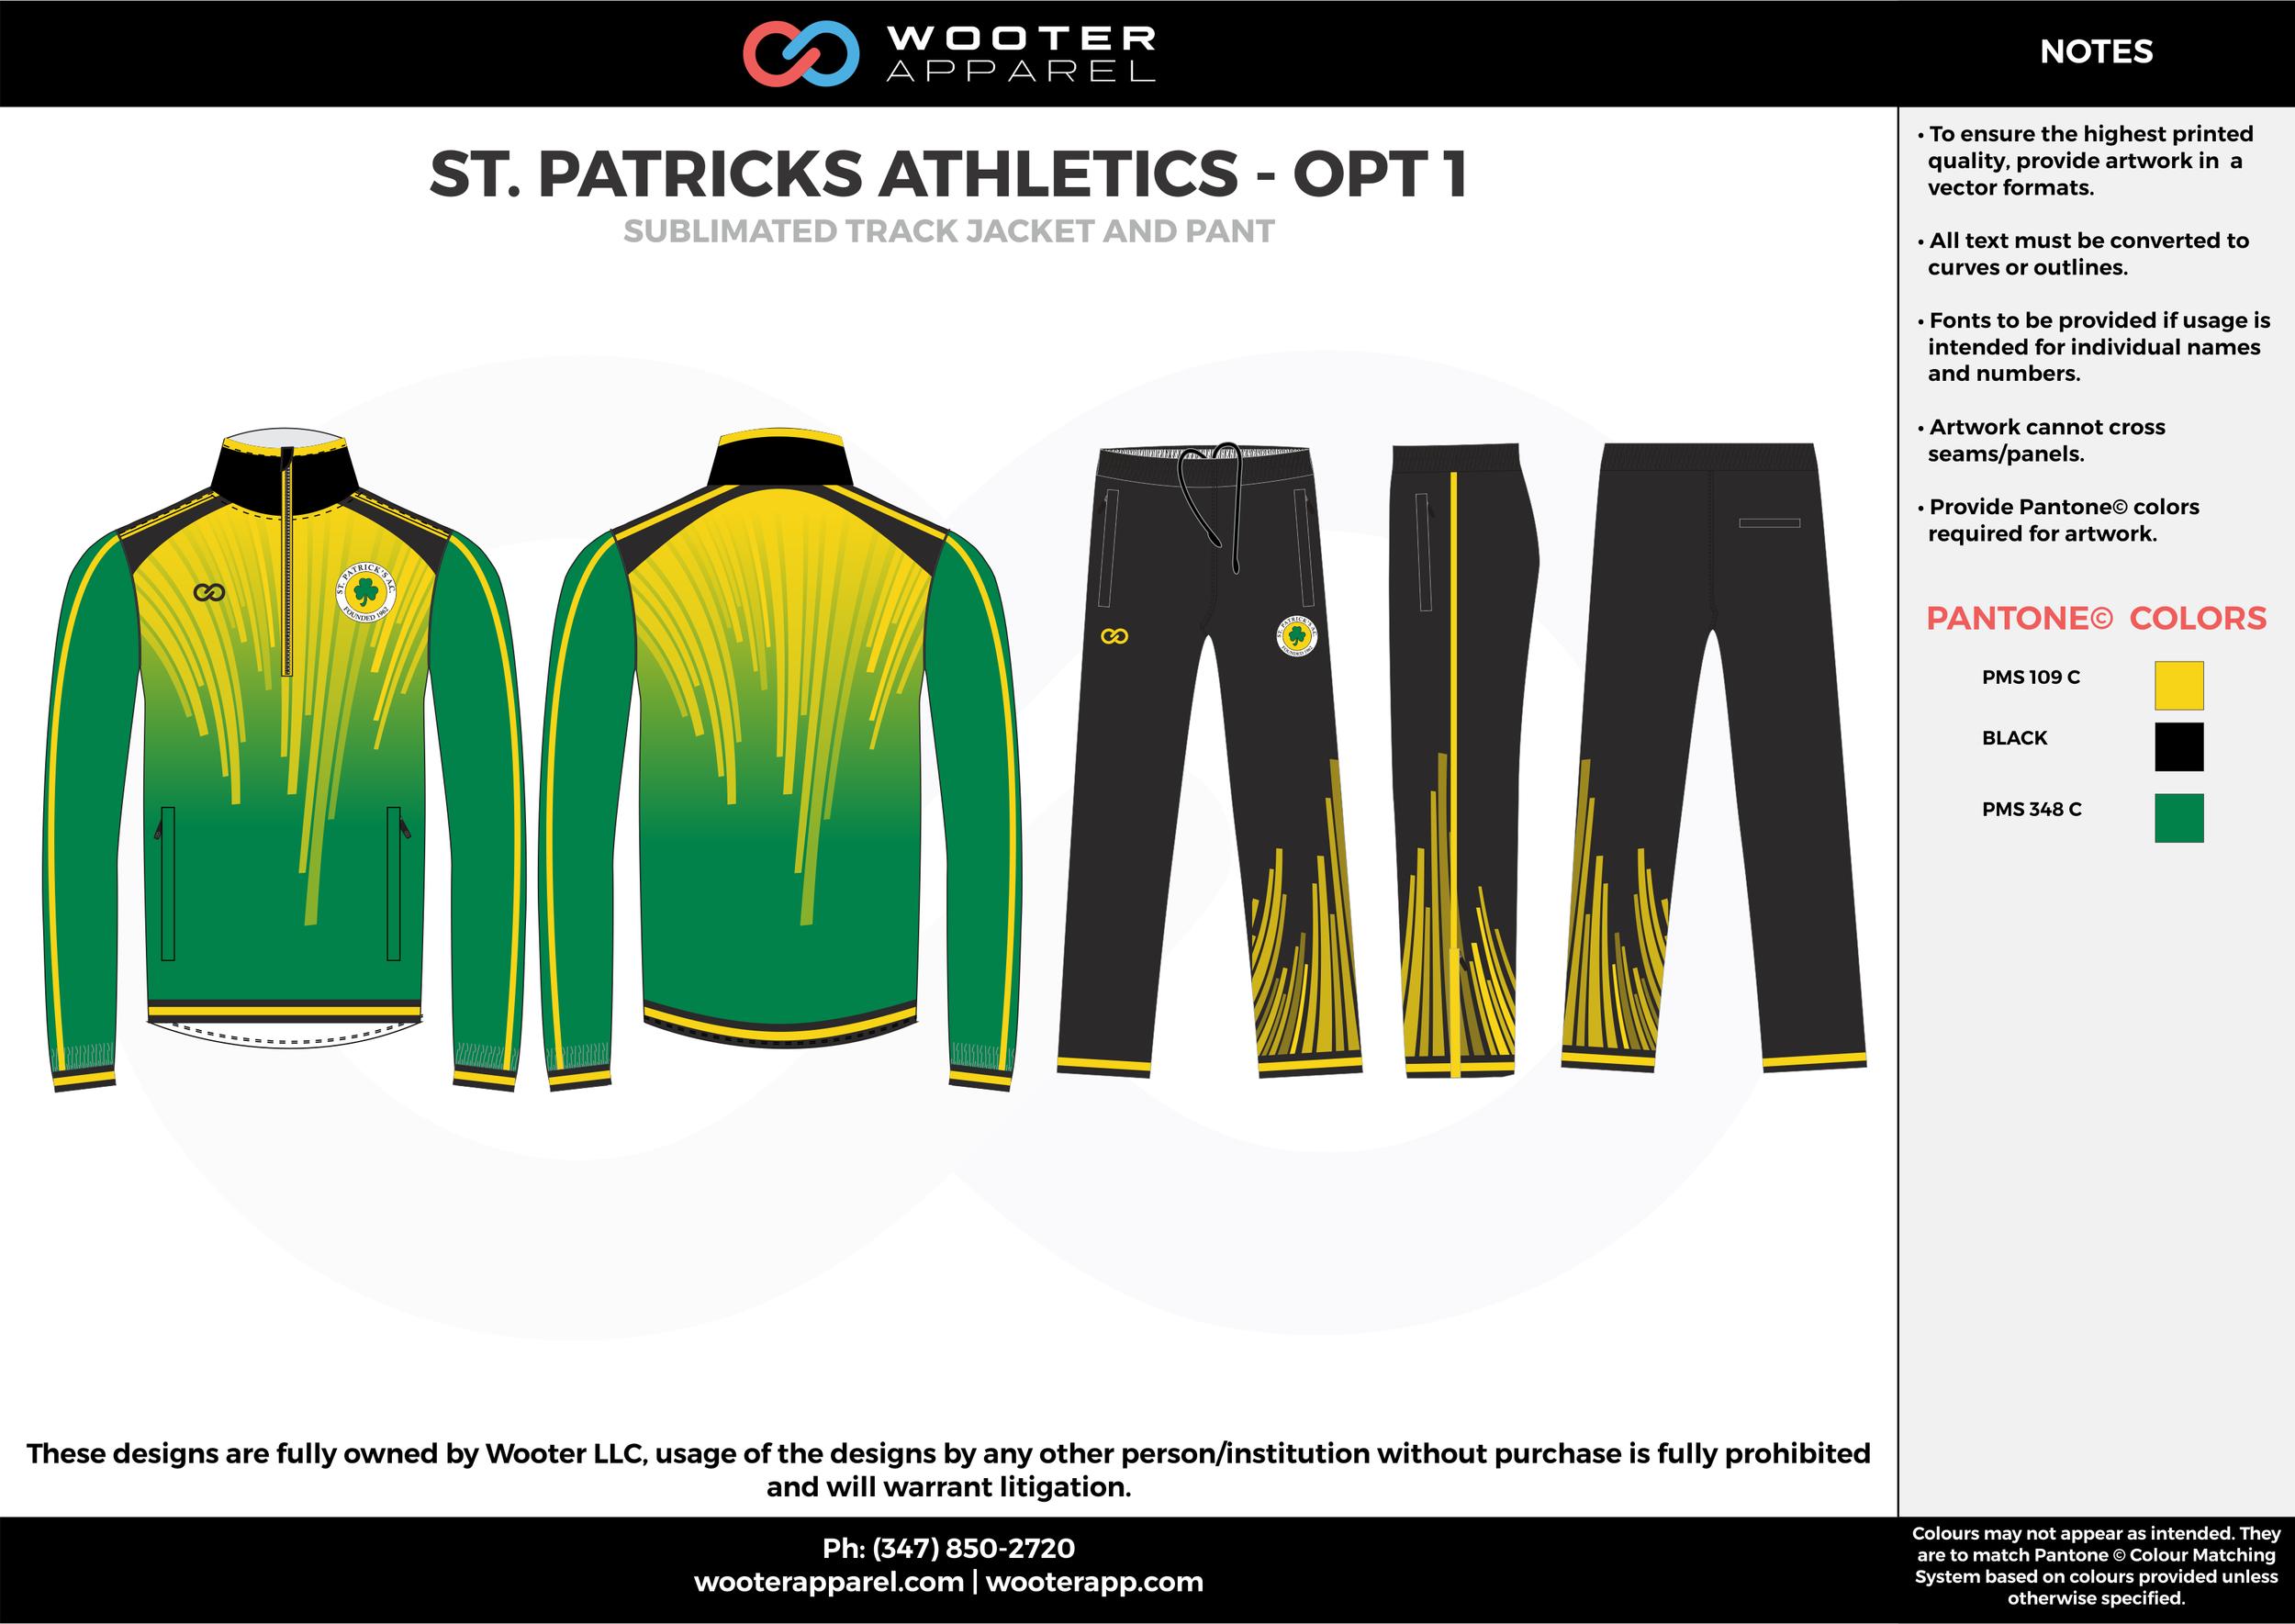 ST. PATRICKS ATHLETICS - OPT1  green yellow black track Jacket, Track Pants, Tracksuit, Warmup Suit